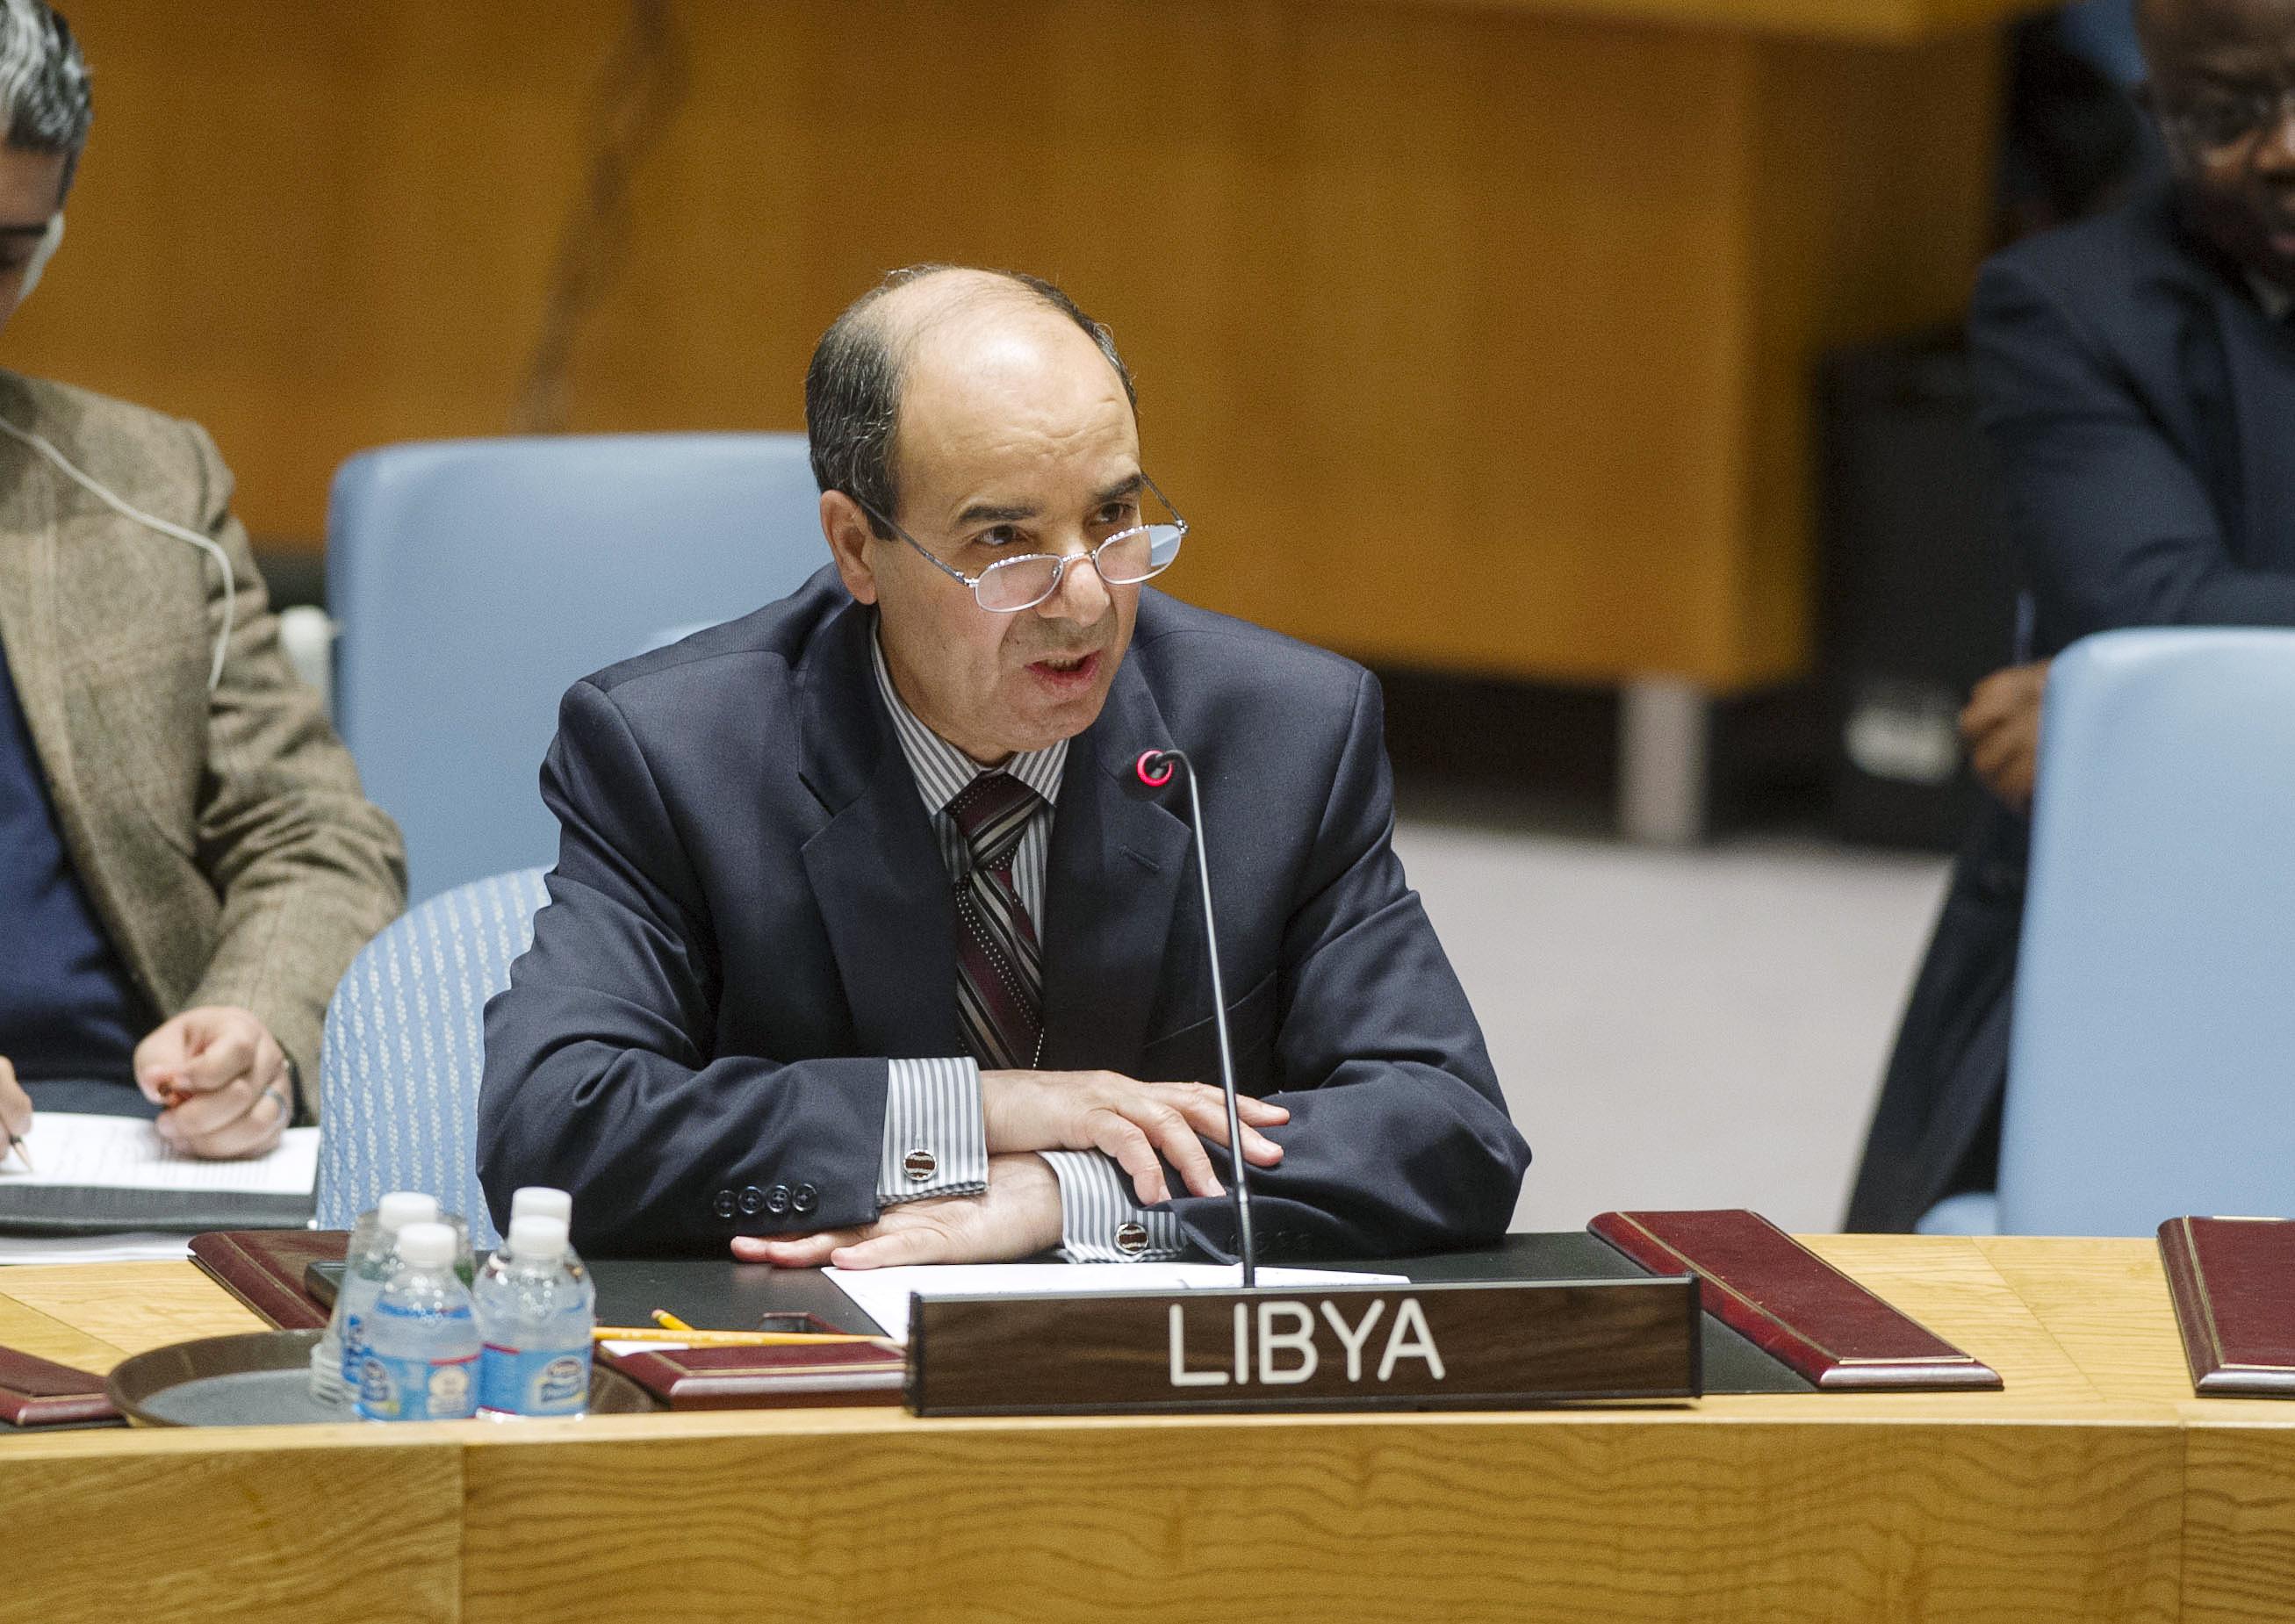 Ibrahim OA Dabbashi, Representante Permanente de Libia ante la ONU. / UN Photo/Amanda Voisard